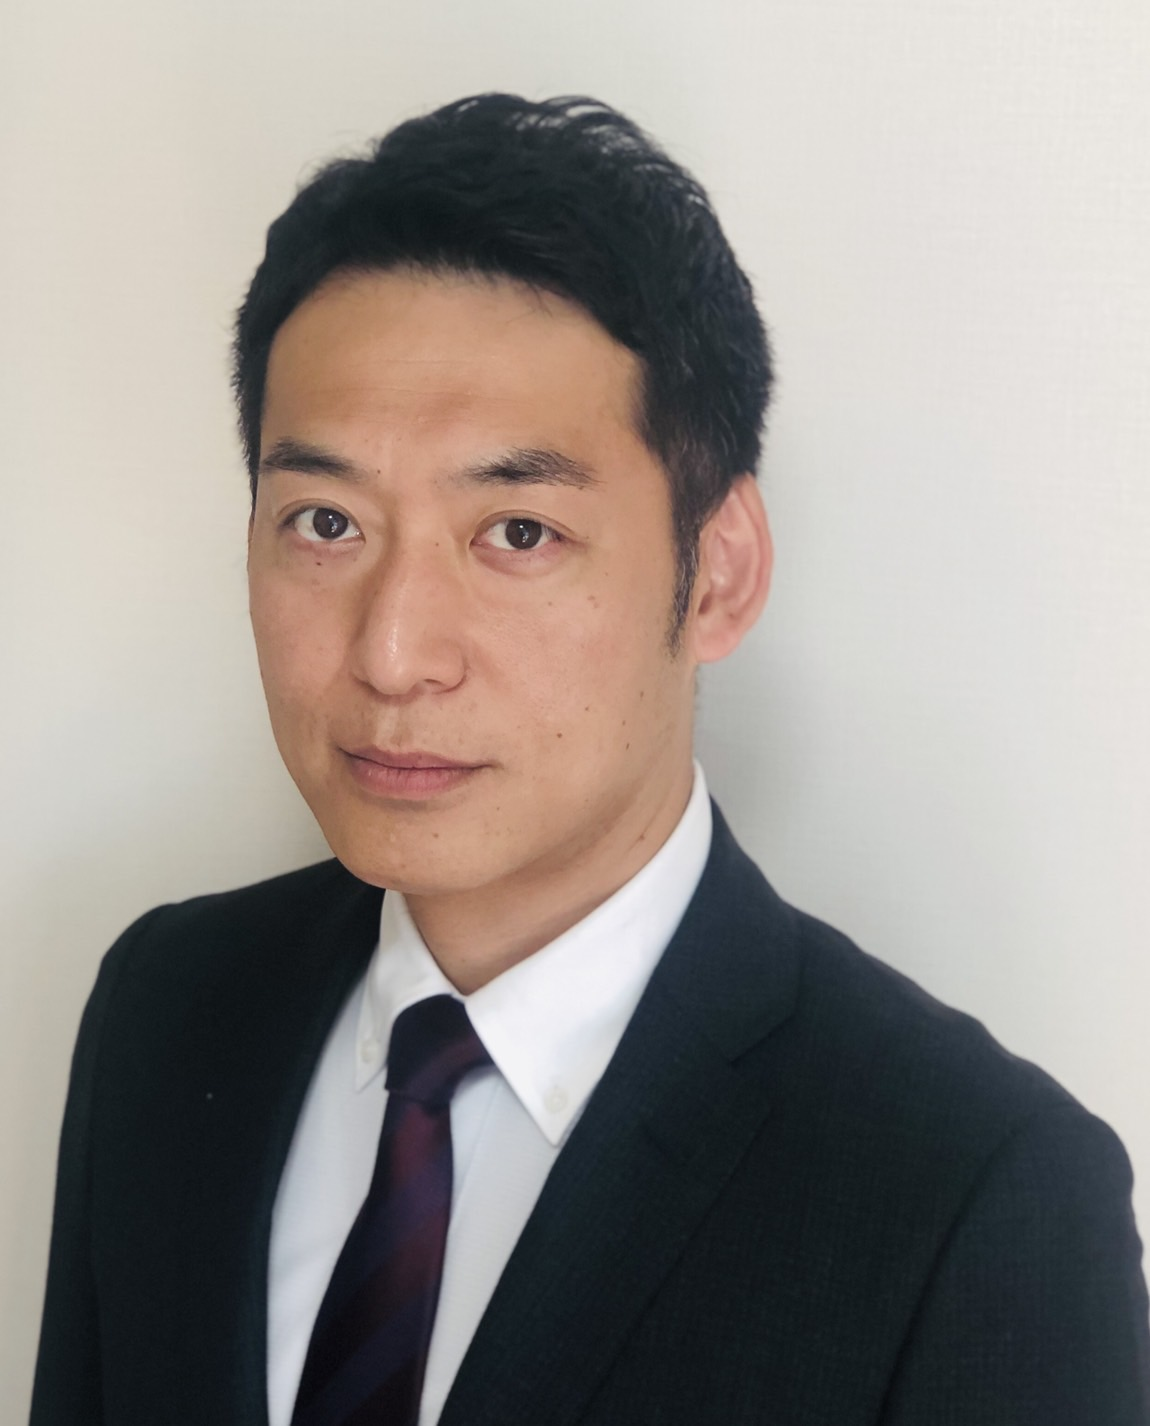 Masahiro Matsushita (002)